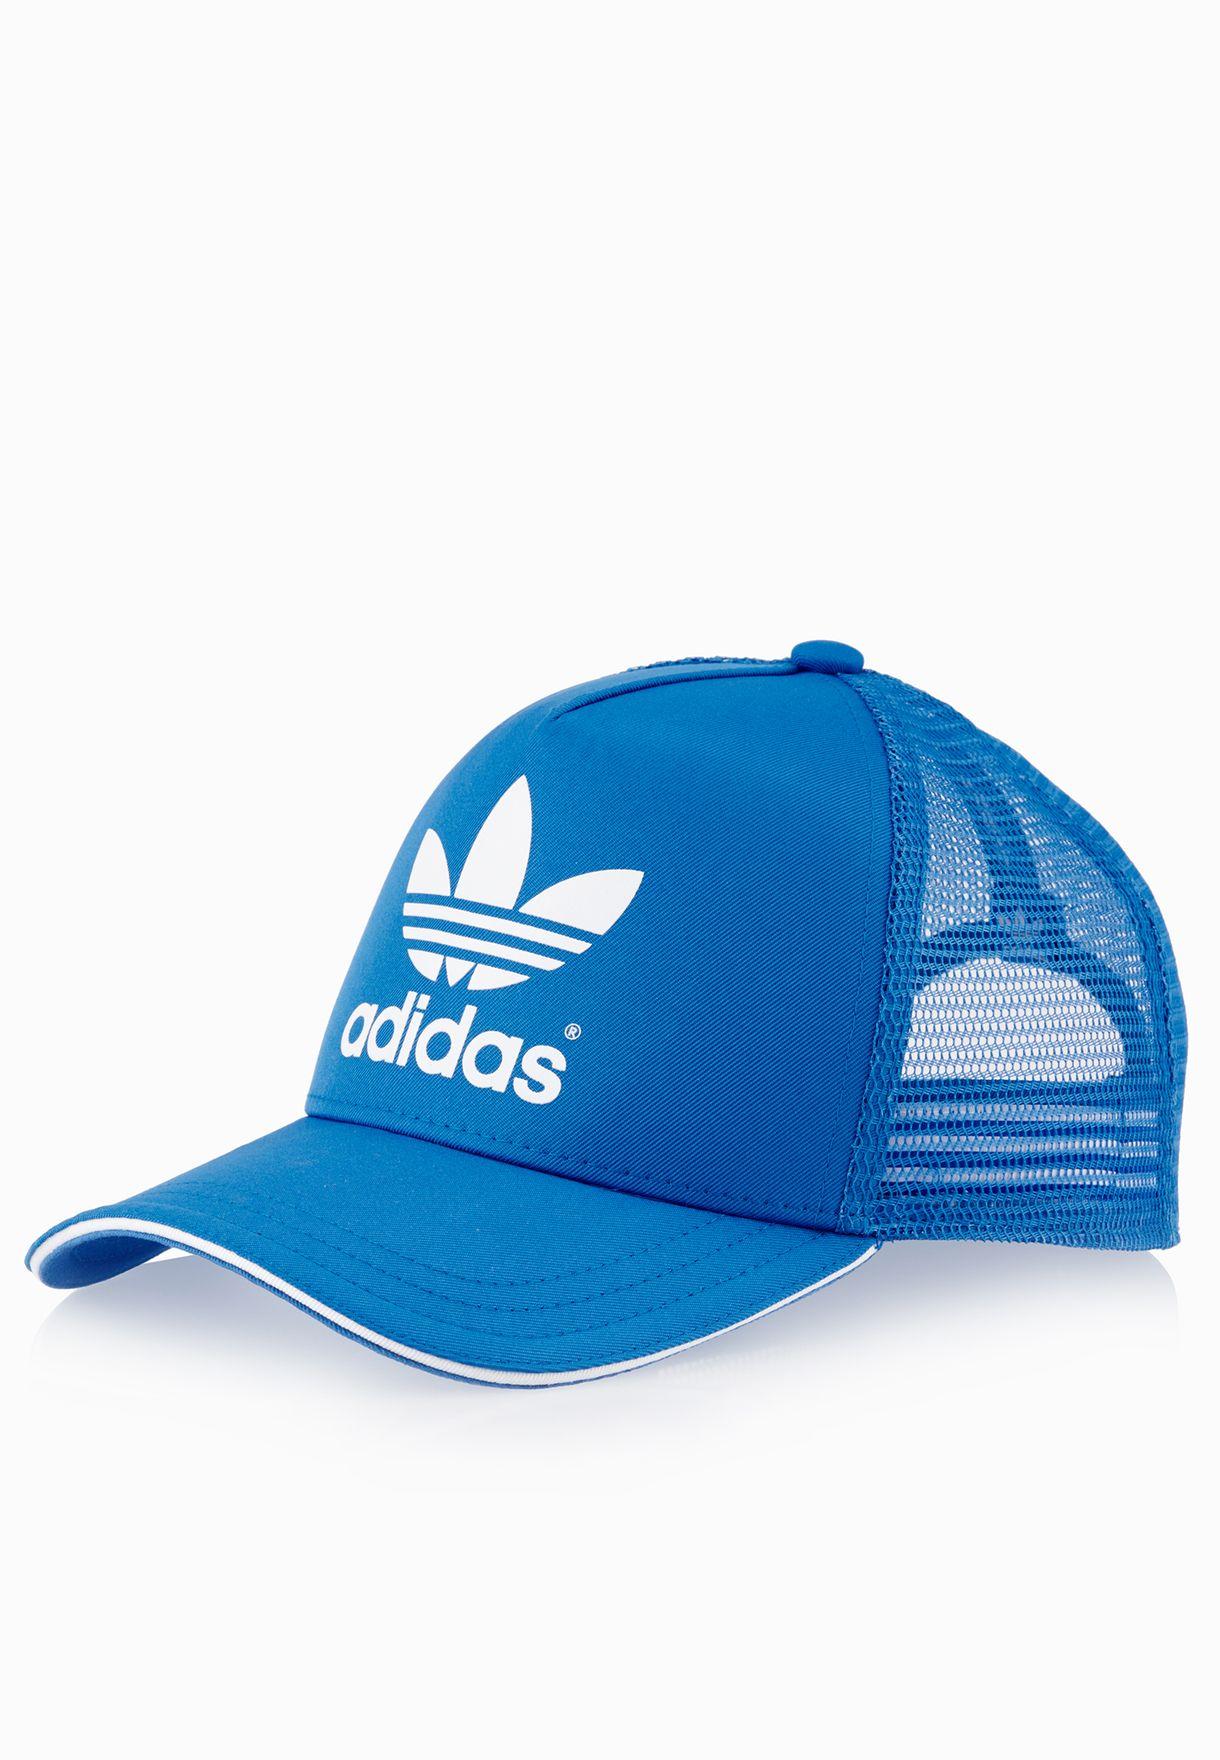 ee8f28942a336 Shop adidas Originals blue Trefoil Trucker Cap AC2487 for Women in ...